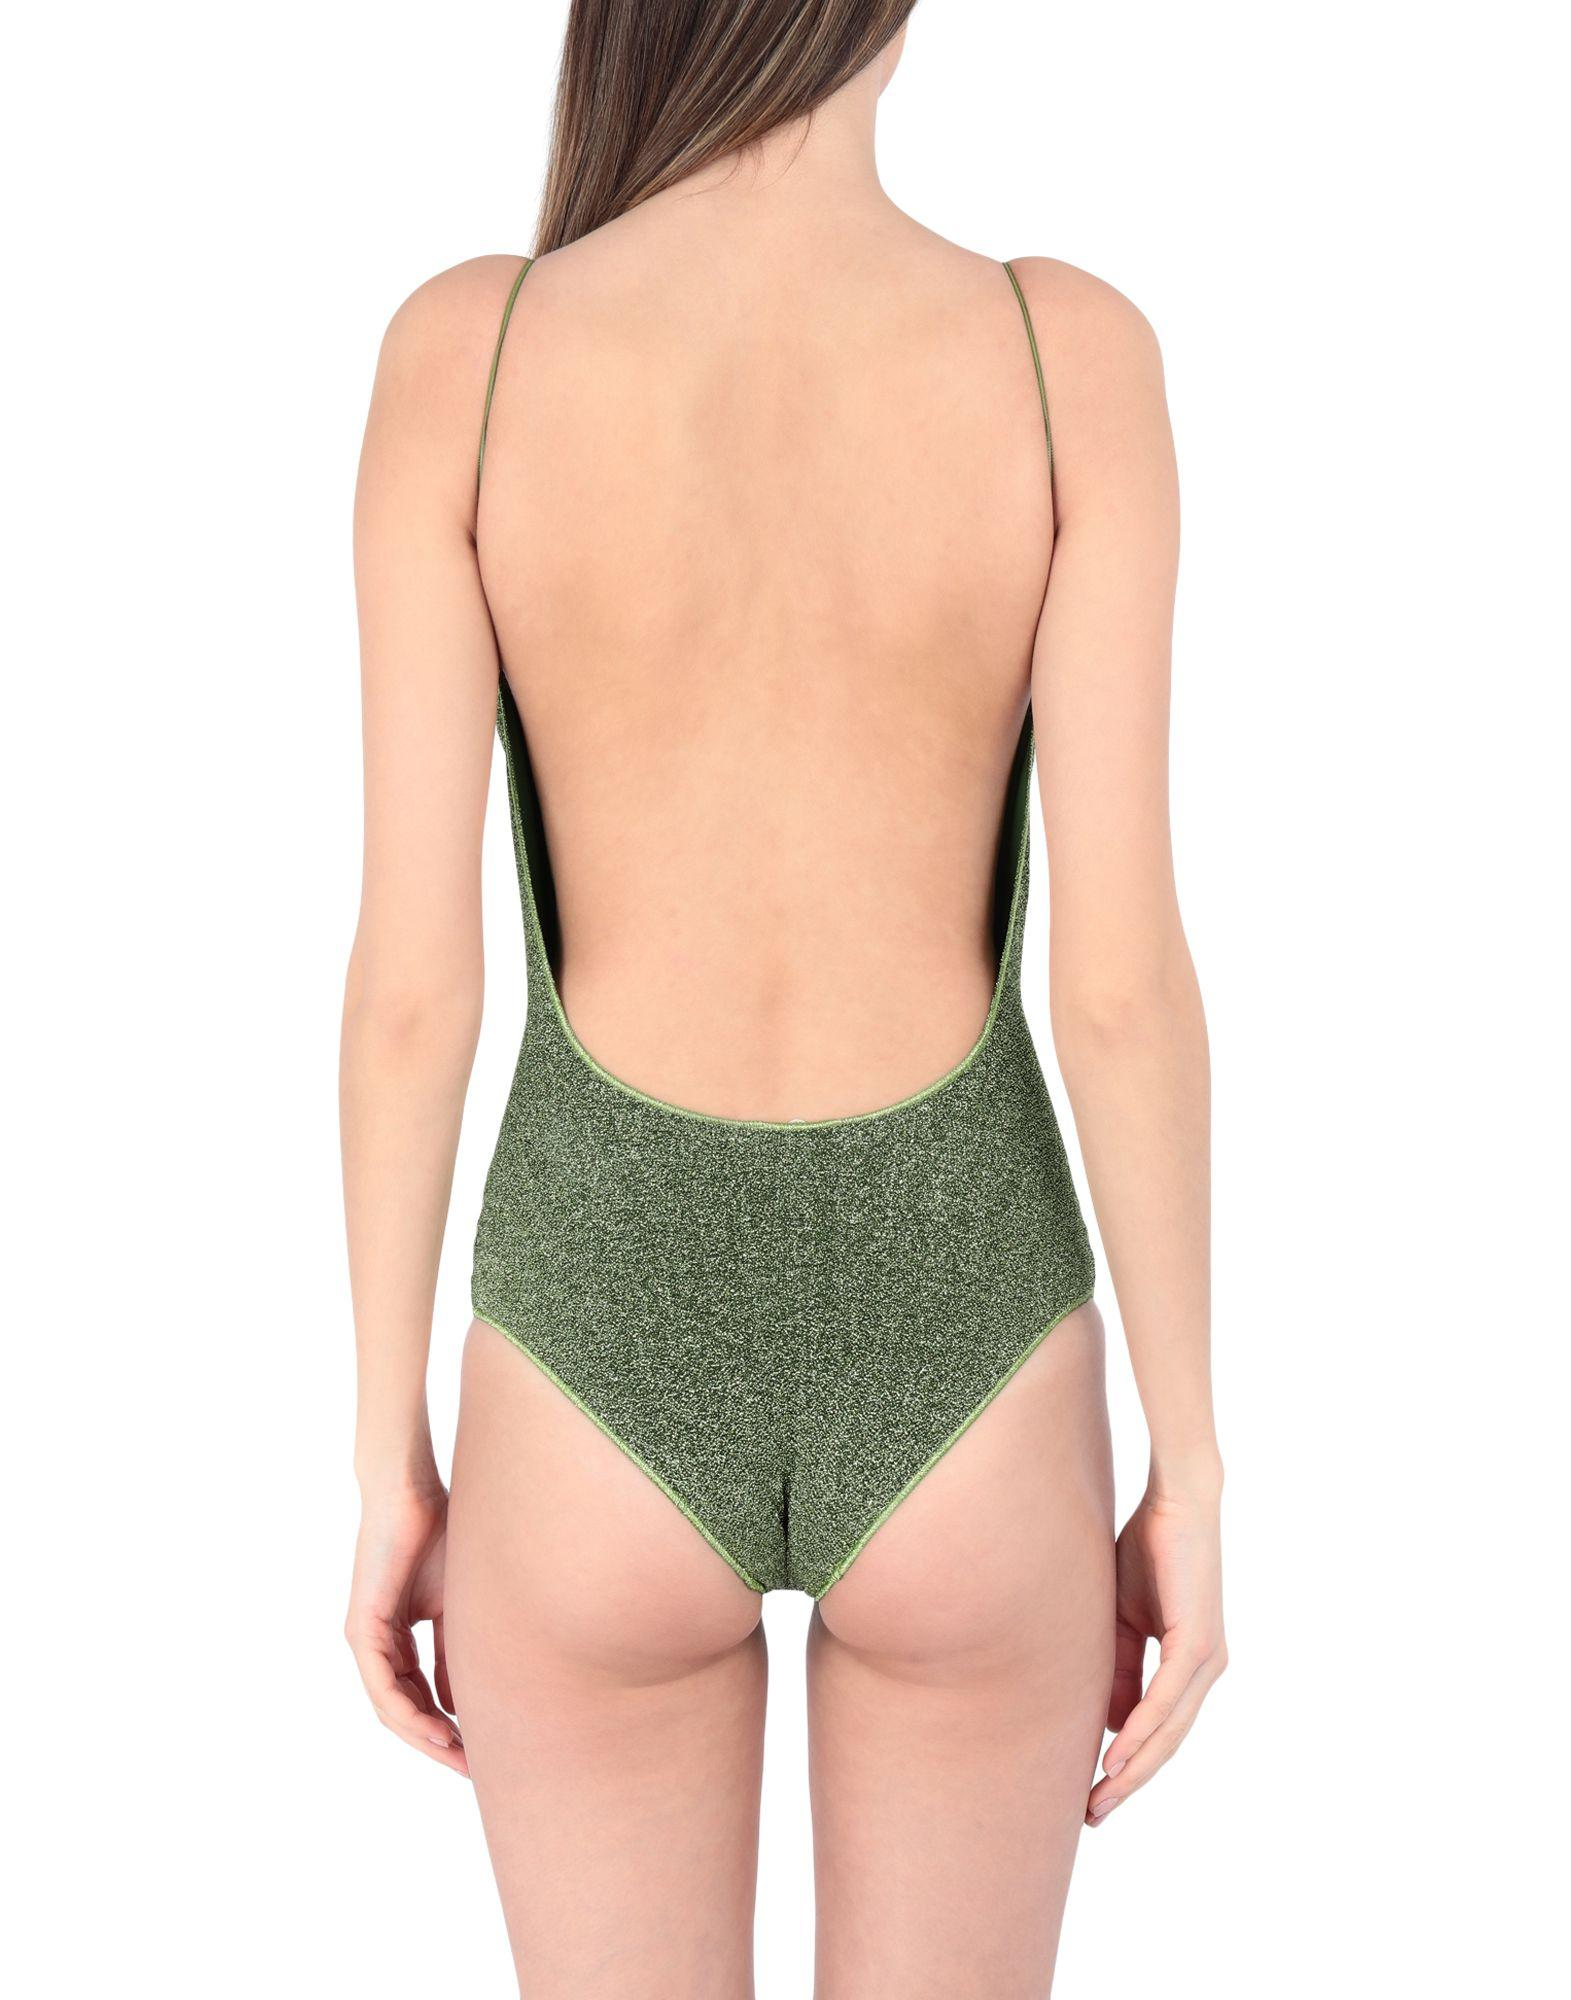 a5336421d48 ... One-piece Swimsuit - Lyst. View fullscreen